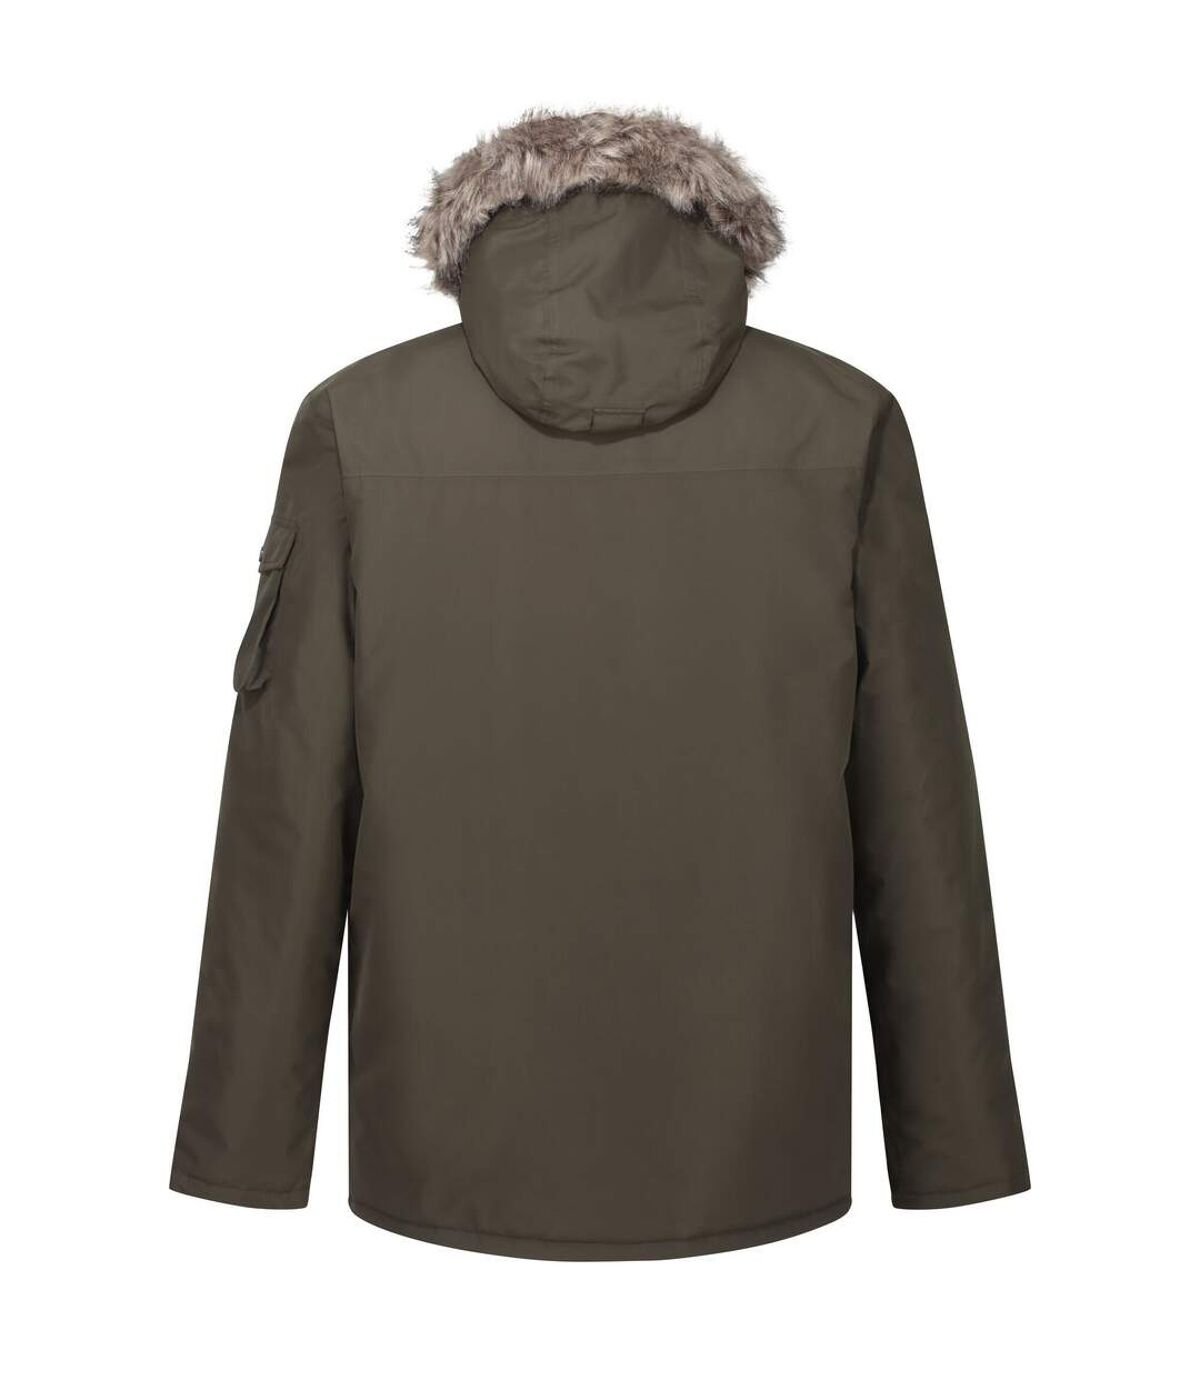 Regatta Mens Salinger II Faux Fur Insulated Parka (Dark Khaki) - UTRG5301